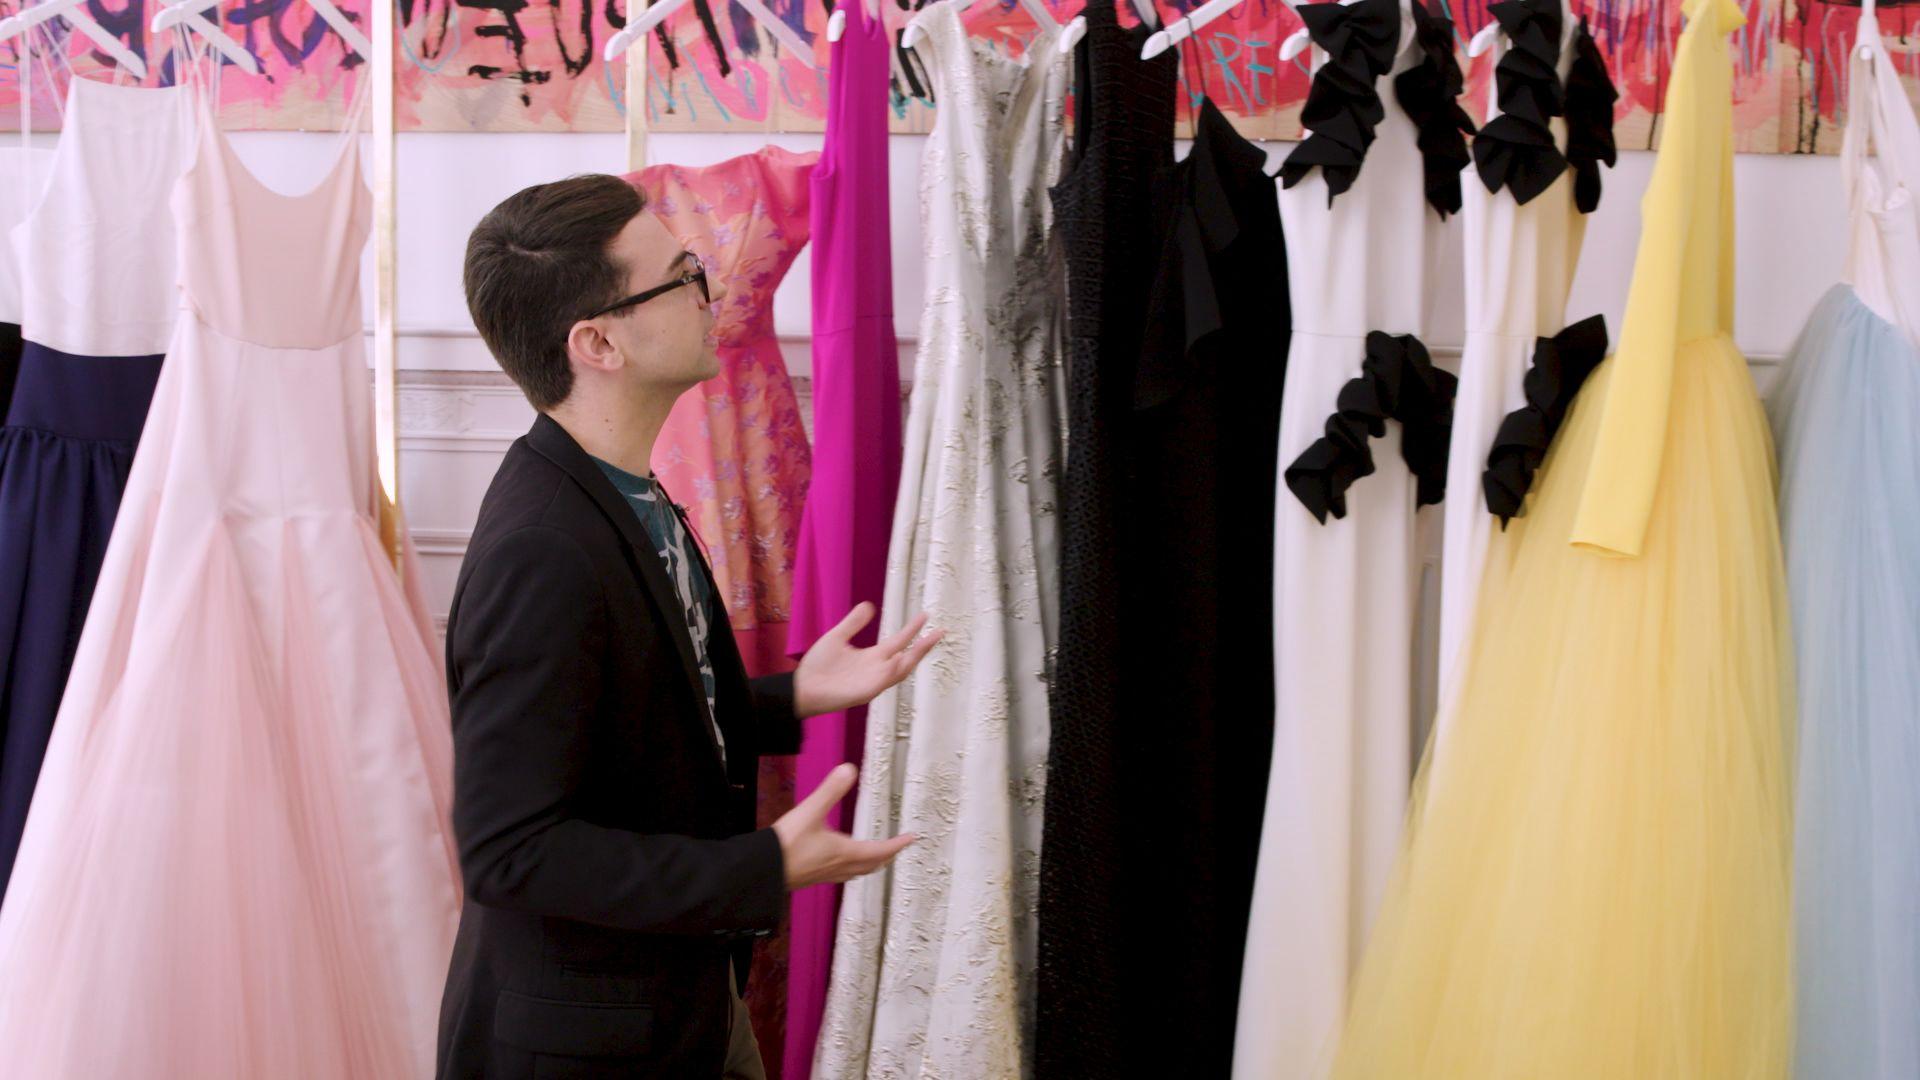 Inside Christian Siriano's Ultra-Glam, Ultra-Dreamy New York Concept Store